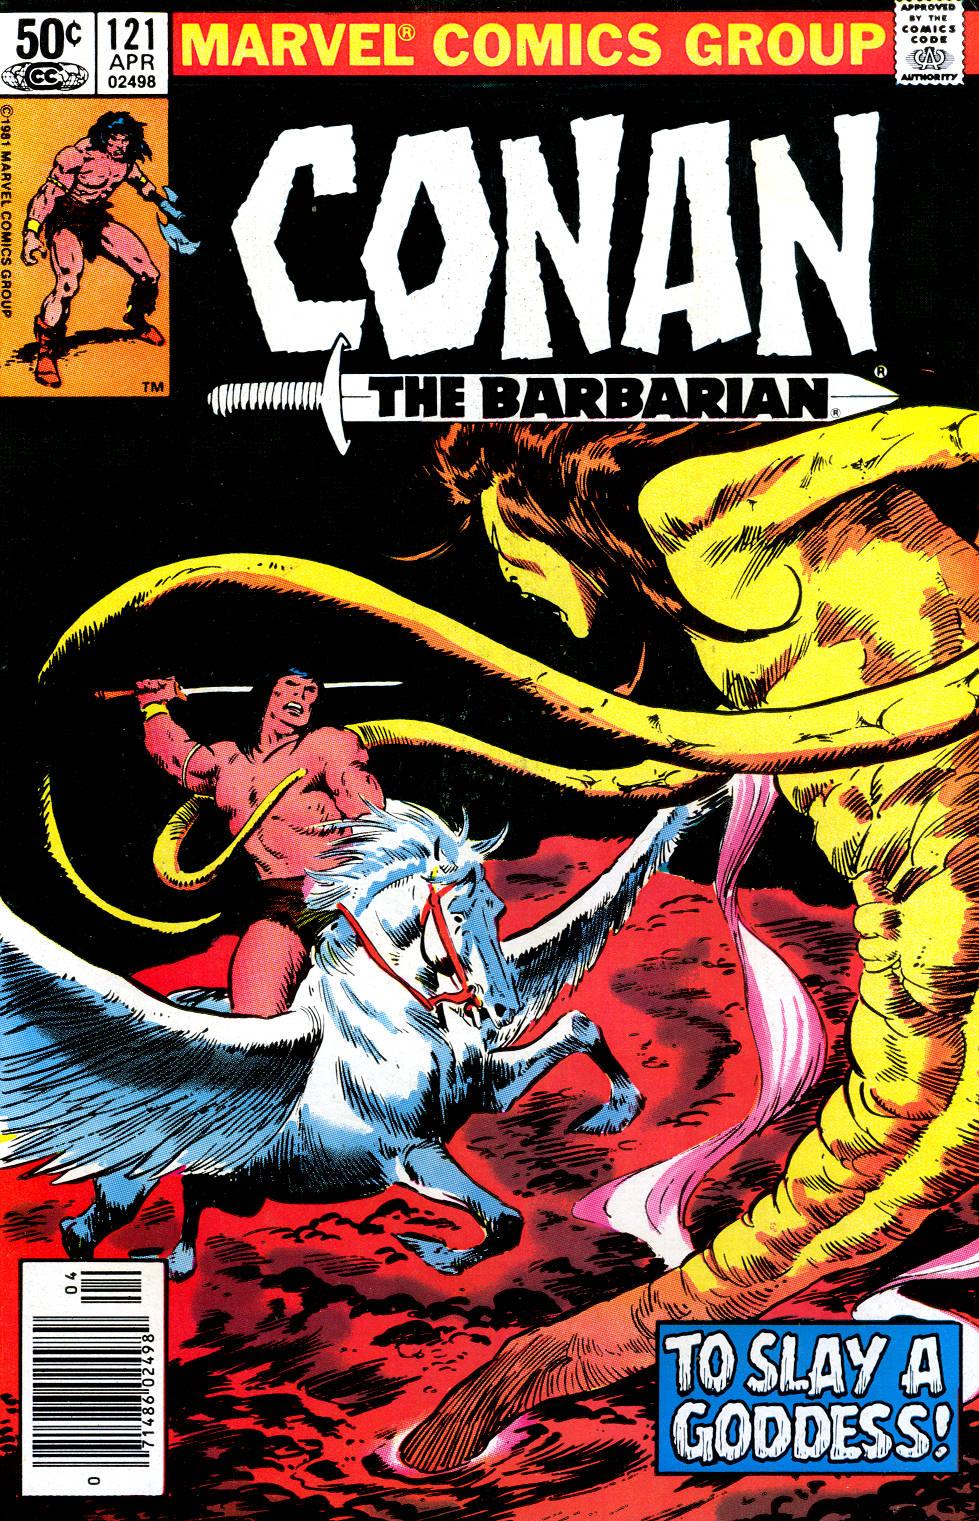 Conan the Barbarian 121